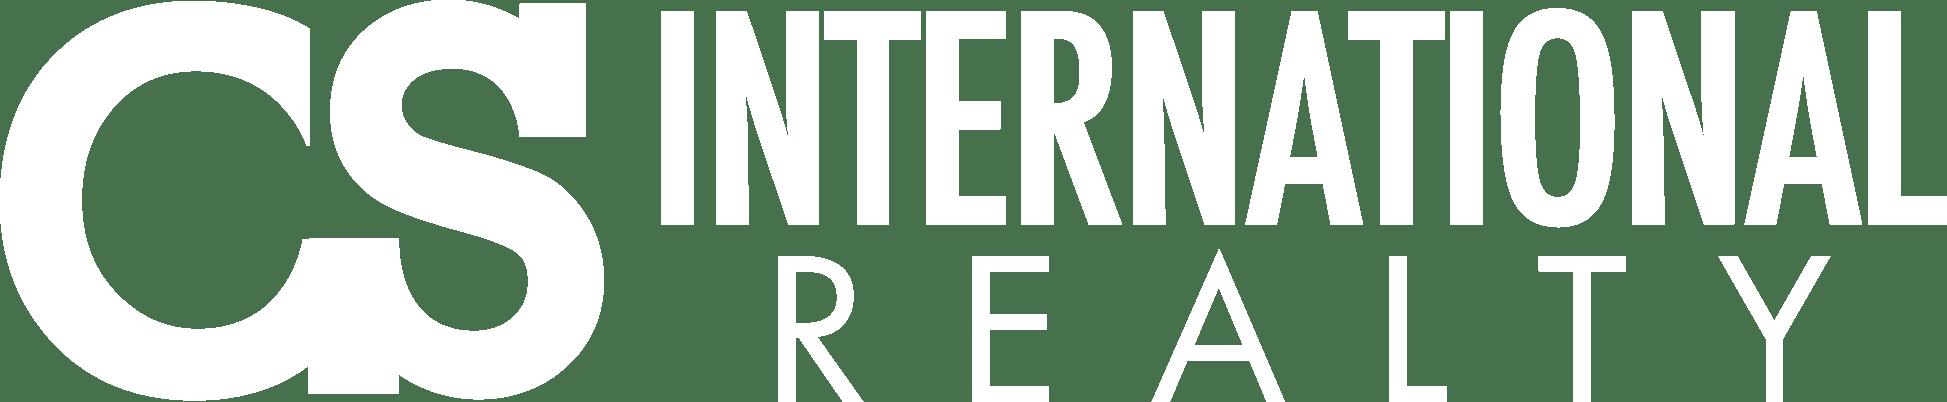 Cs International Realty